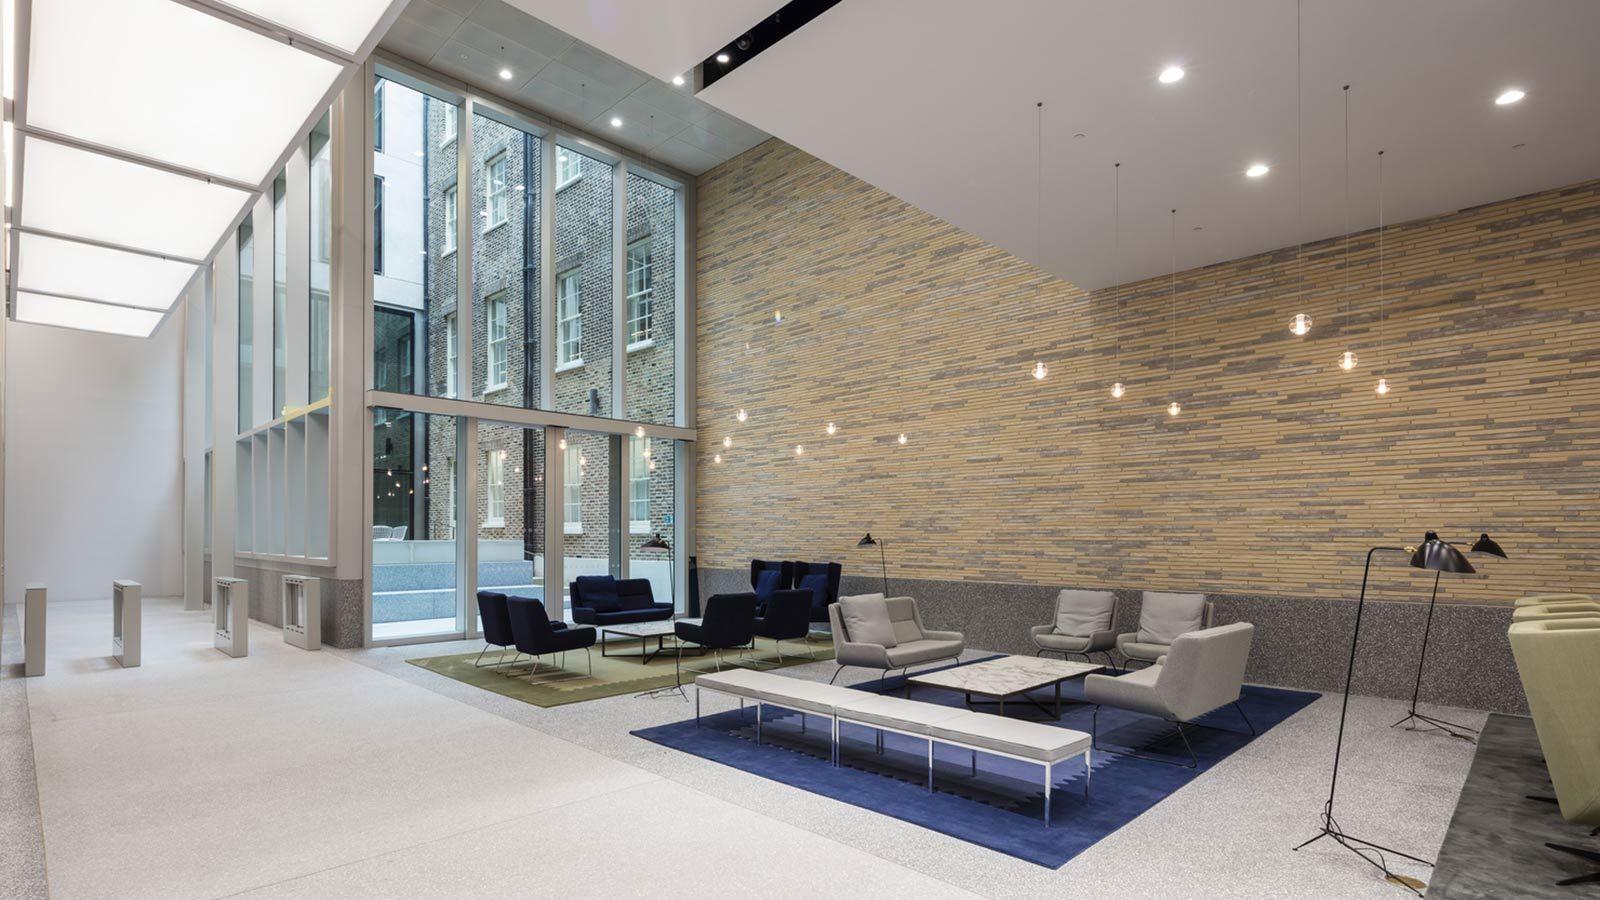 Luxury Modern Office Furniture, W5 – New Burlington Place Building - Mace Group